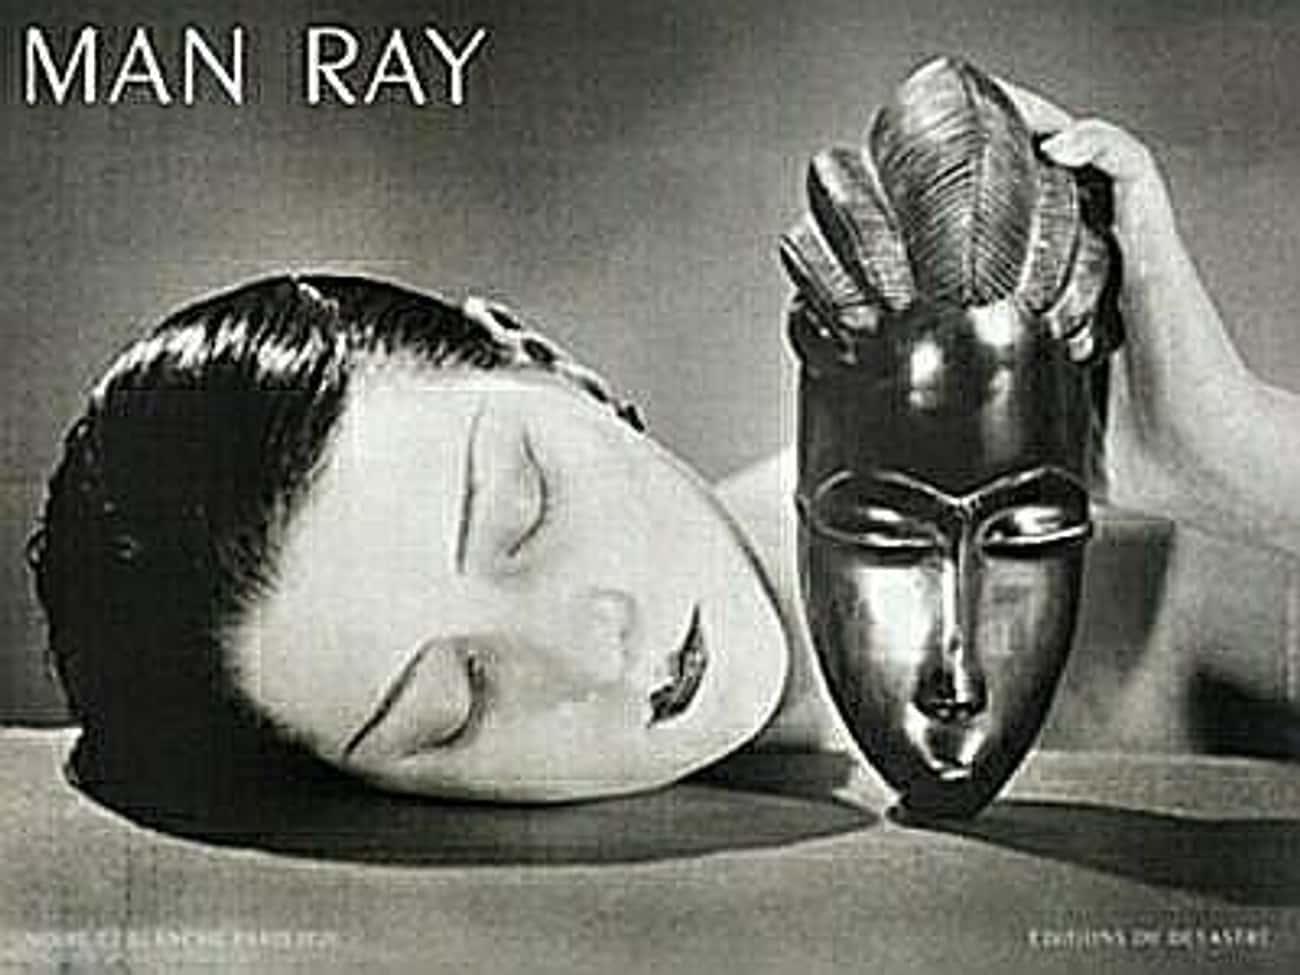 Chez Man Ray, Paris